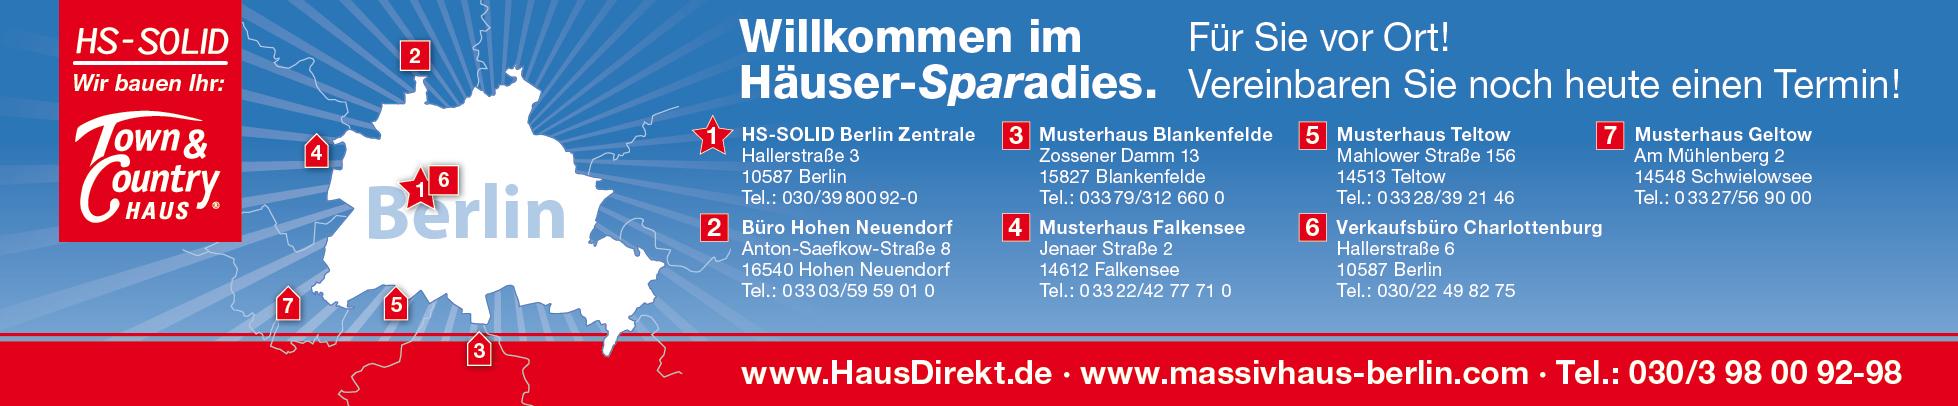 Hs s massivhausblog 7standorte 03 2015 massivhaus berlin for Massivhaus berlin